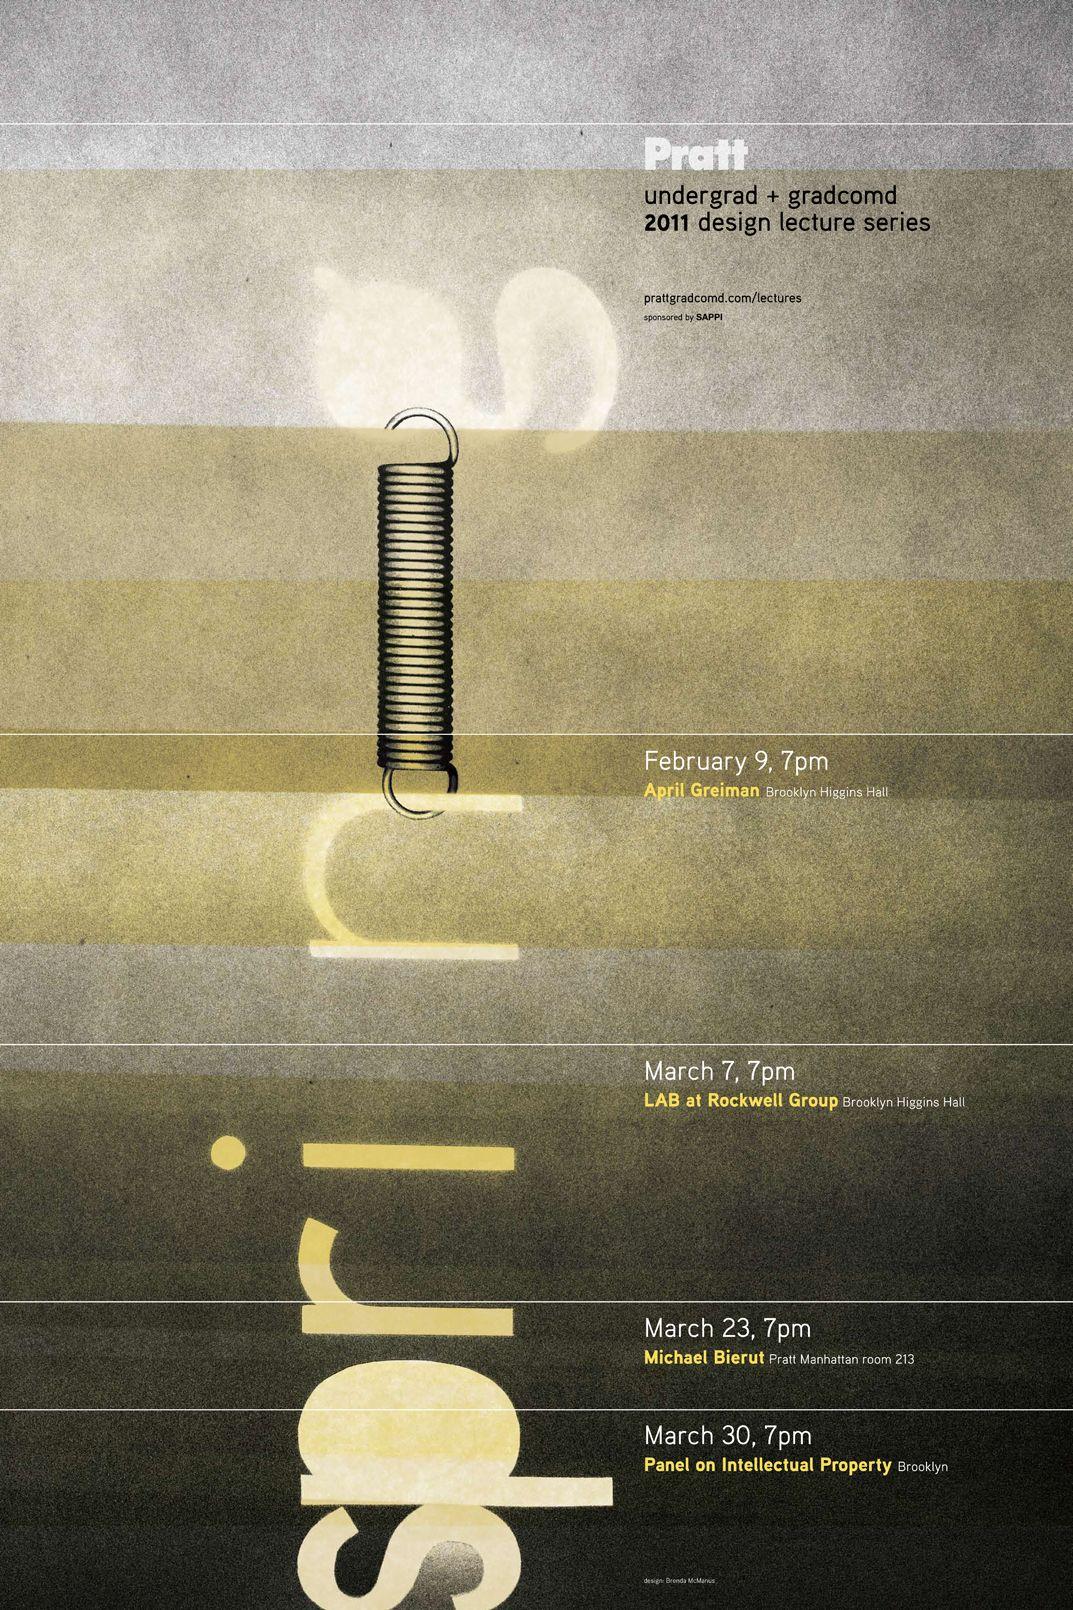 Poster design awards - A How International Poster Design Award Bred Nation